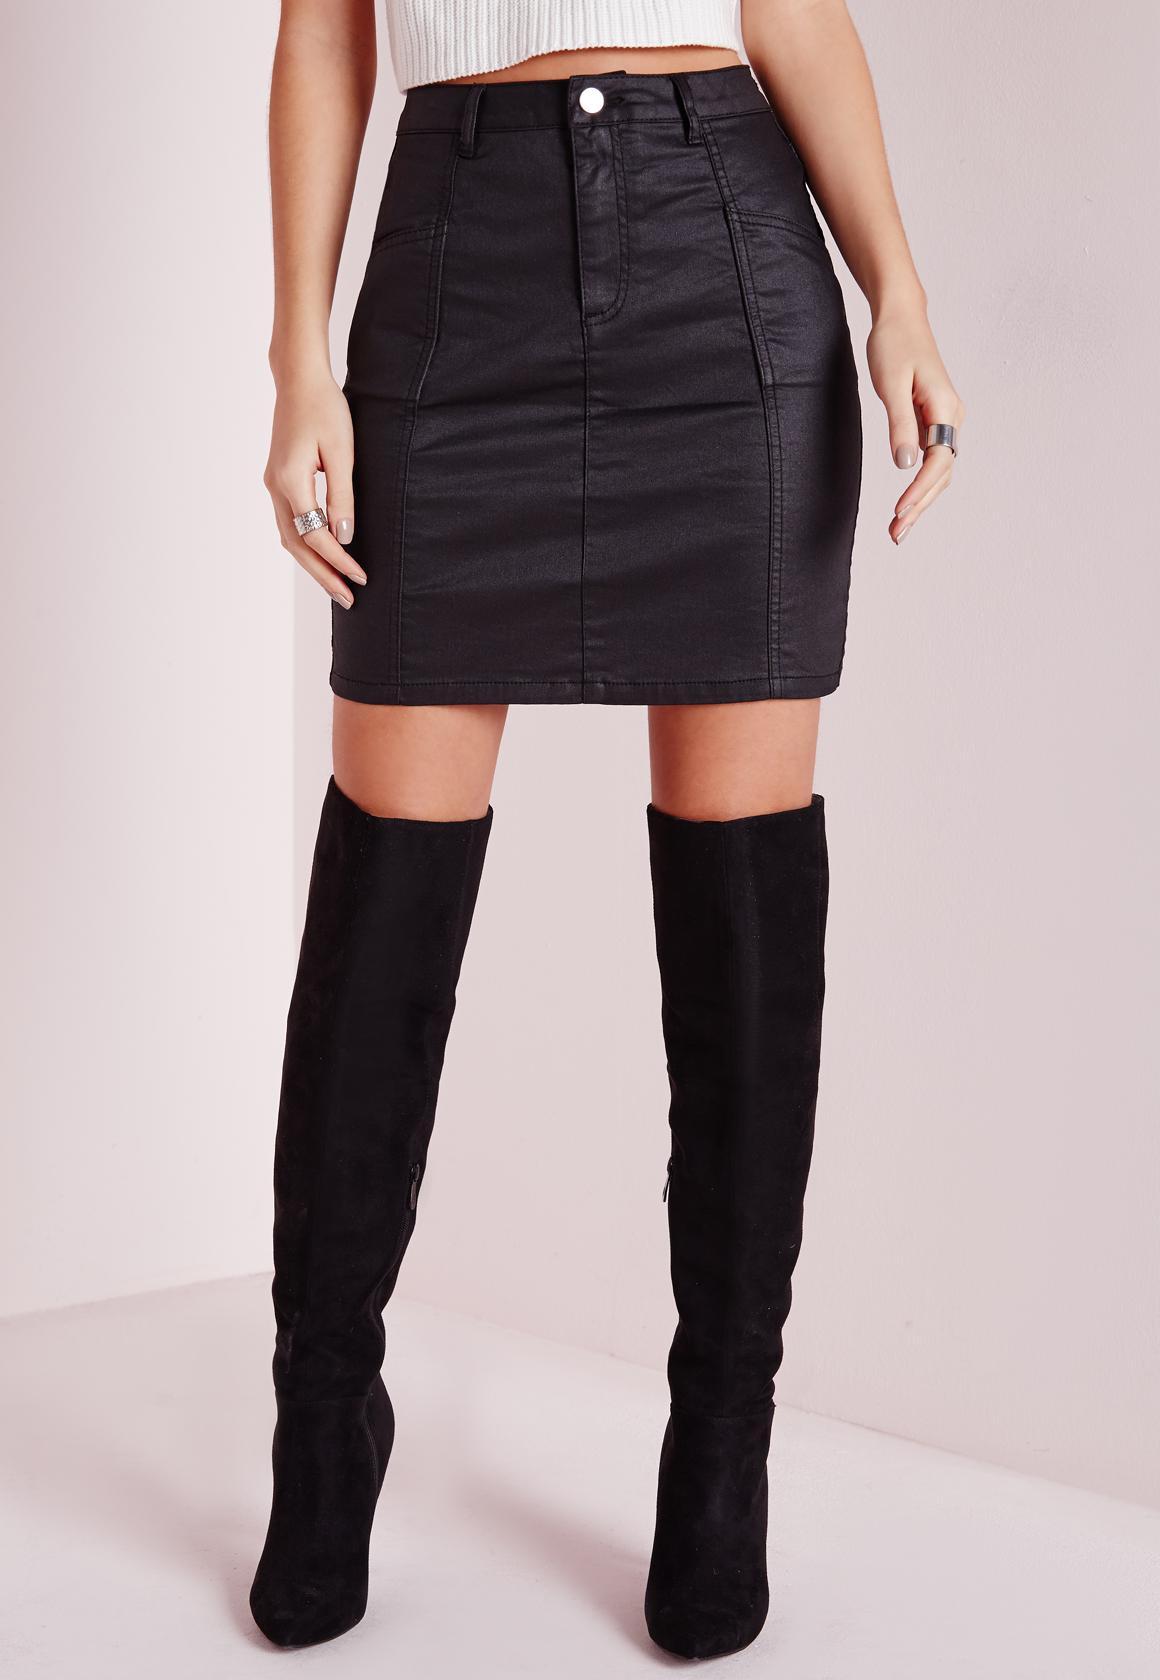 Coated Denim Mini Skirt Black. Previous Next